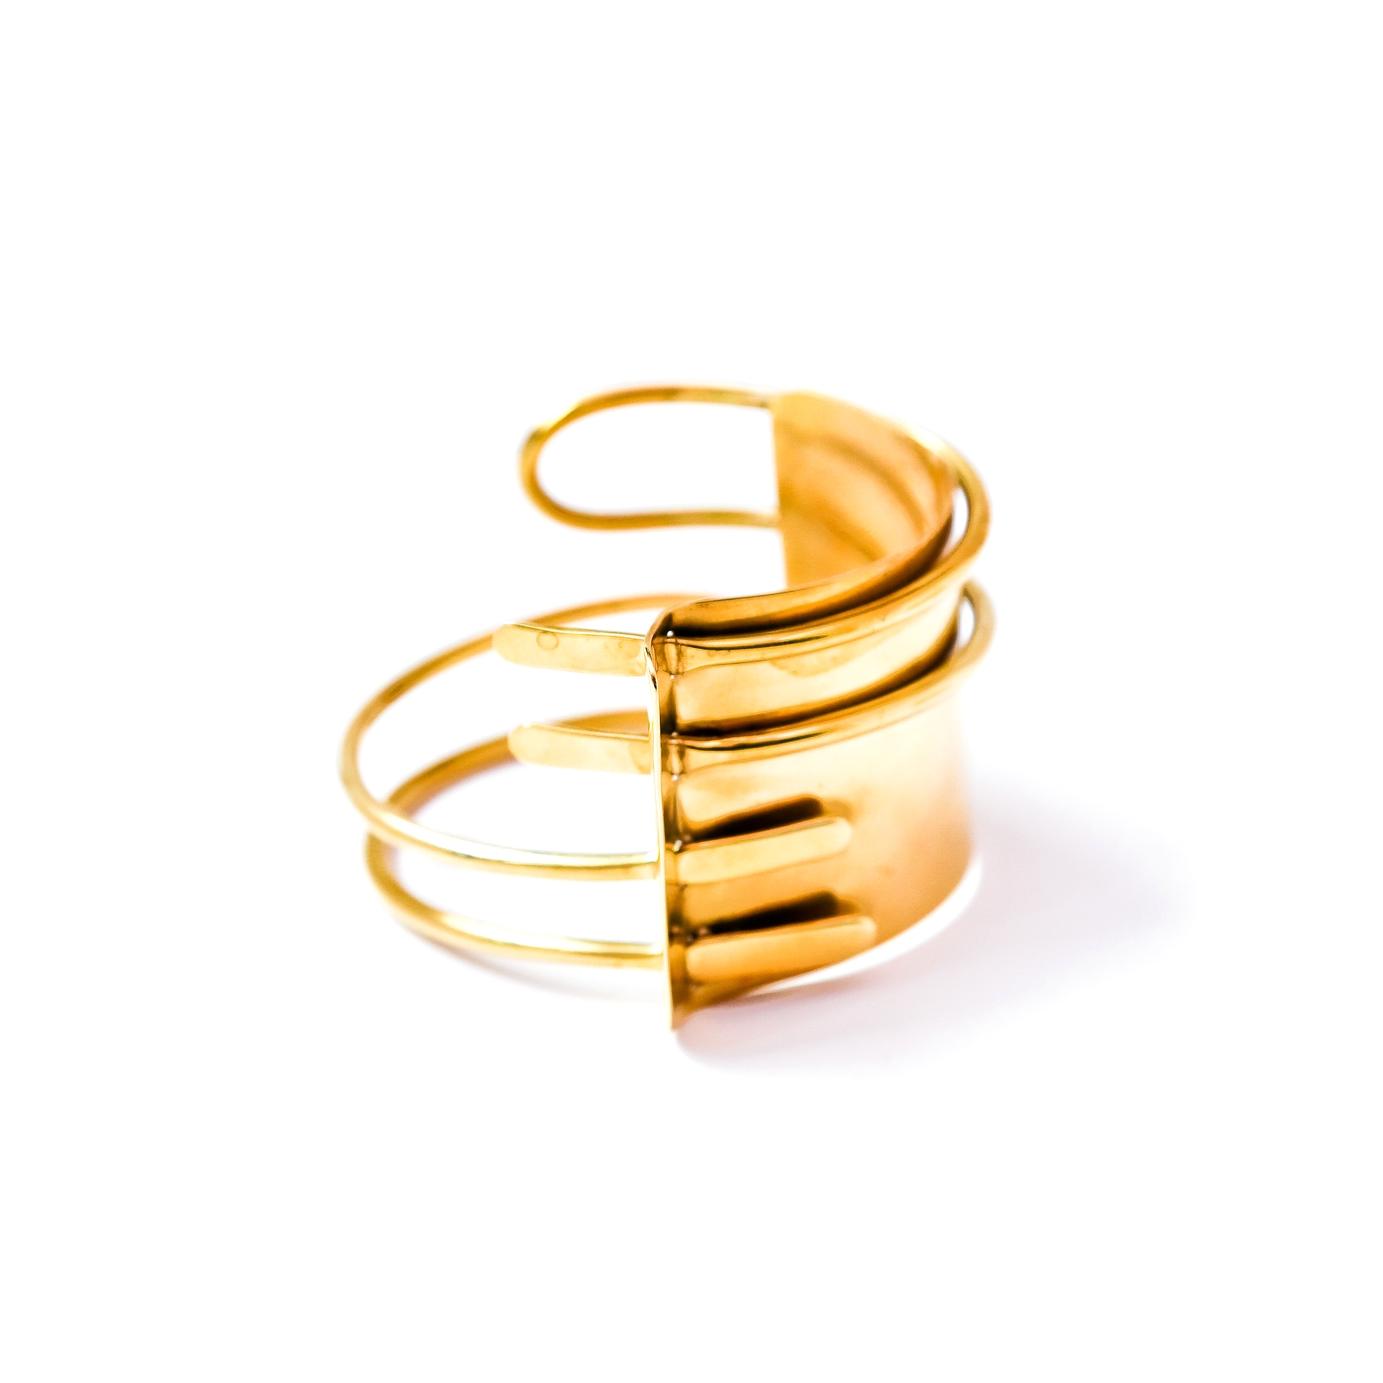 Brass Abstract balance arm band  armlet